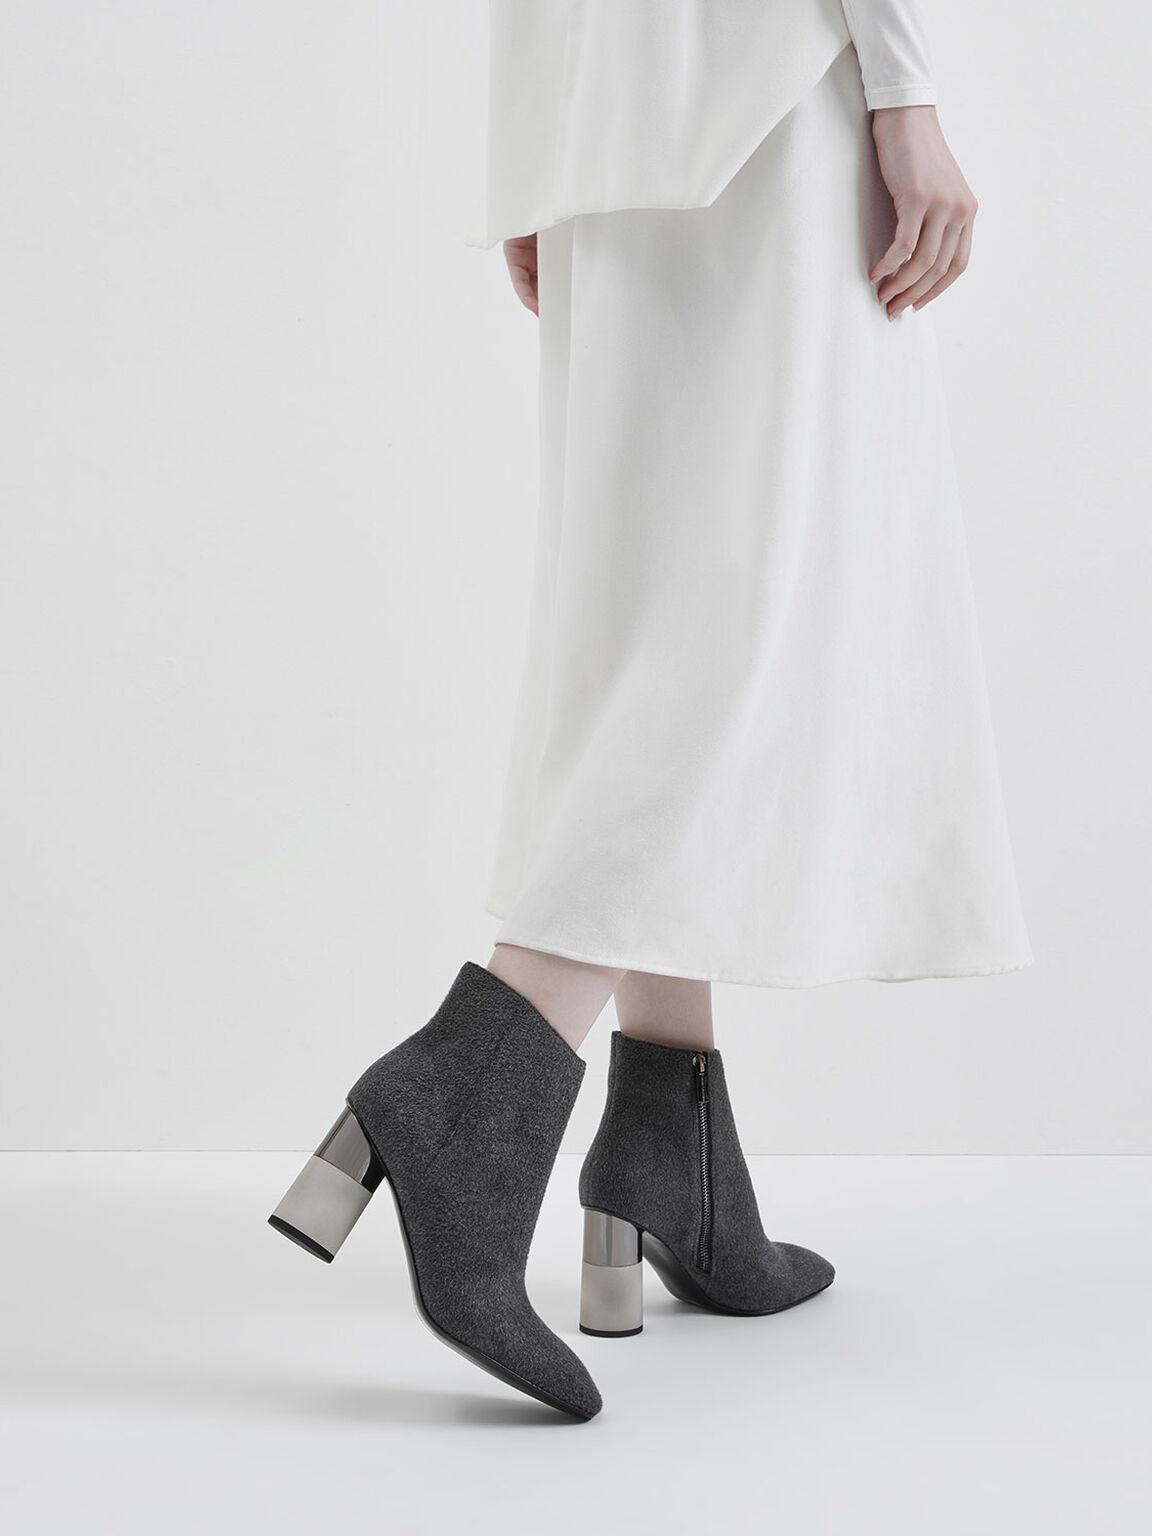 Concrete Heel Felt Ankle Boots, Dark Grey, hi-res